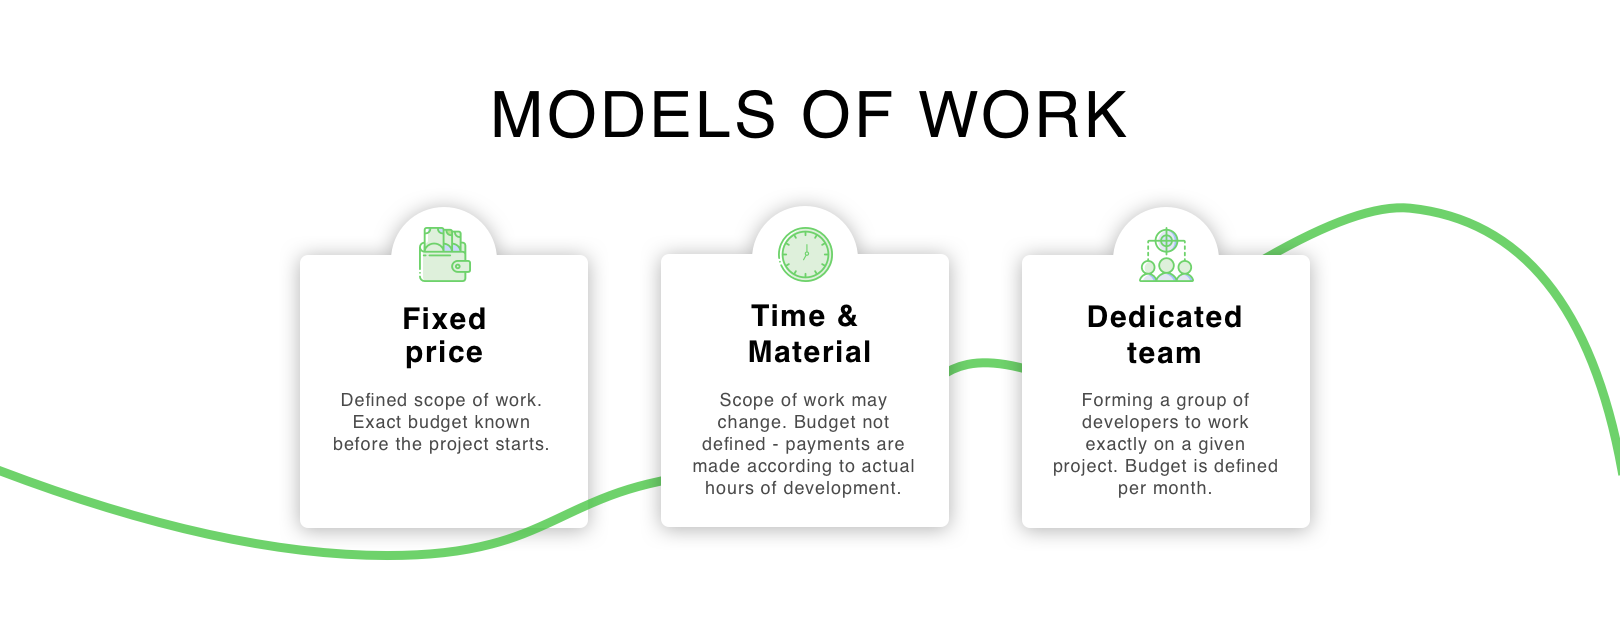 models of work